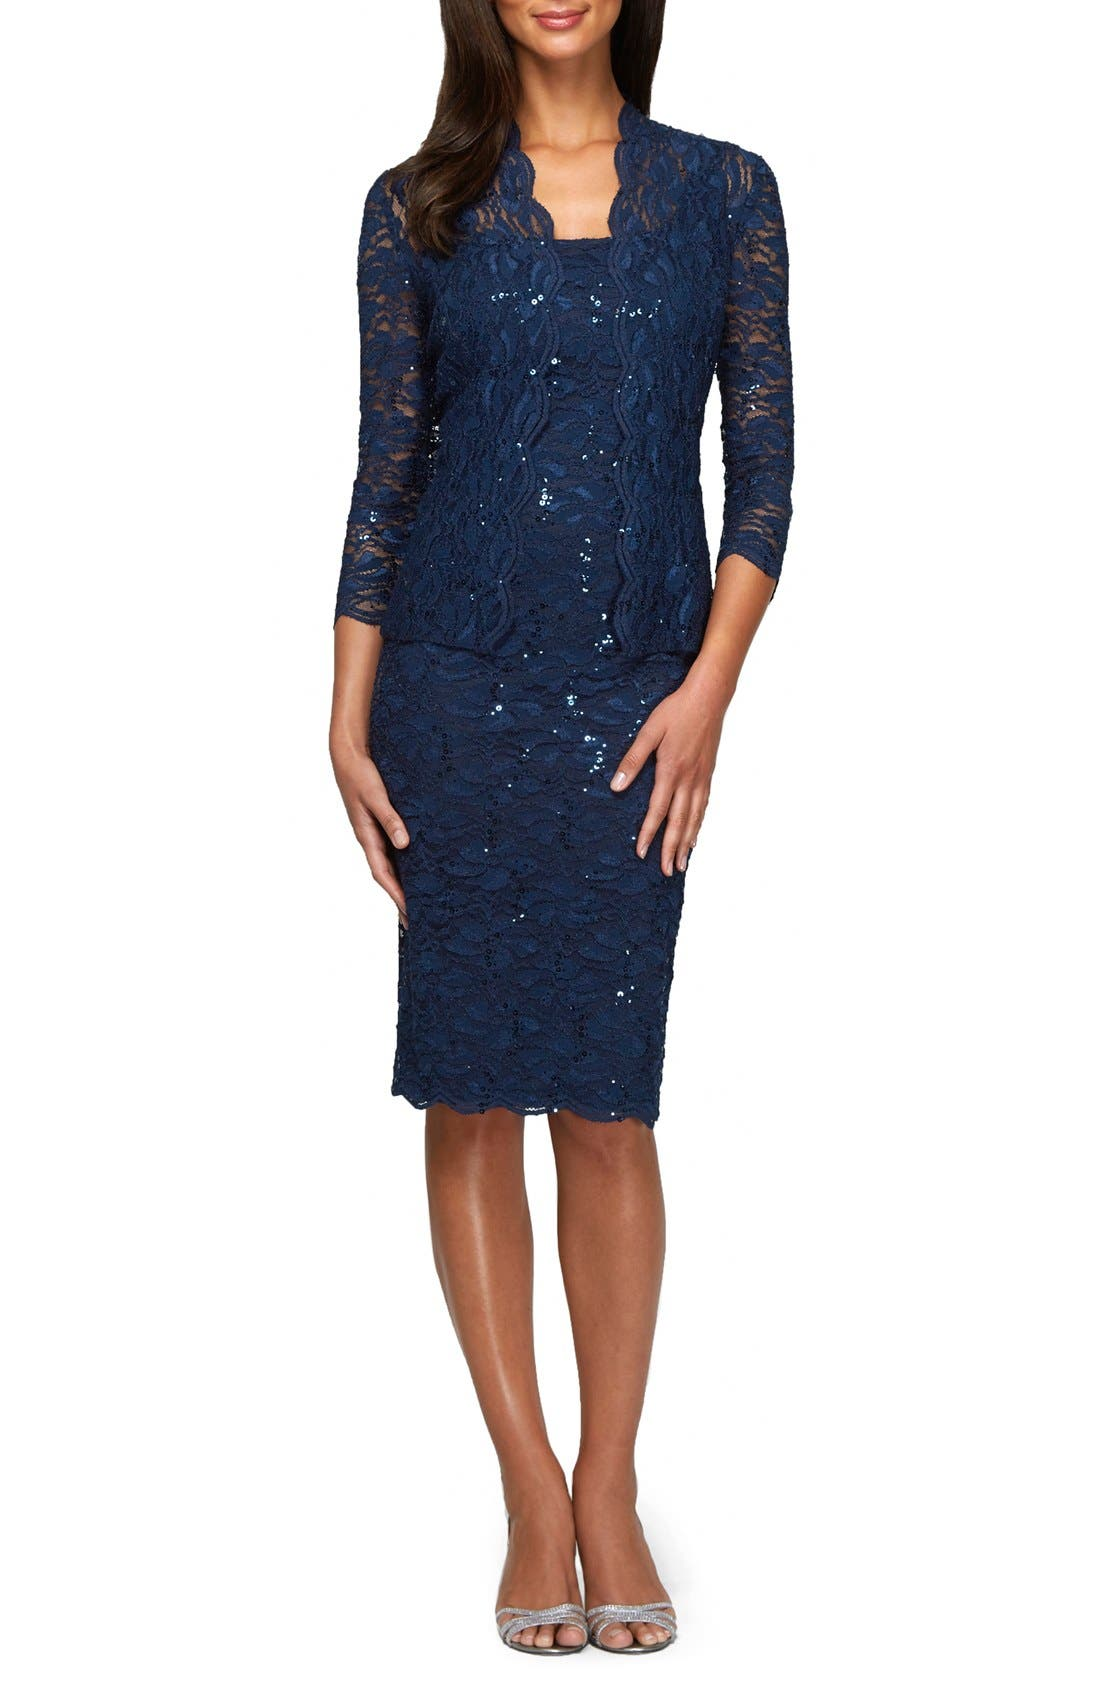 Alternate Image 1 Selected - Alex Evenings Lace Dress & Jacket (Regular & Petite)